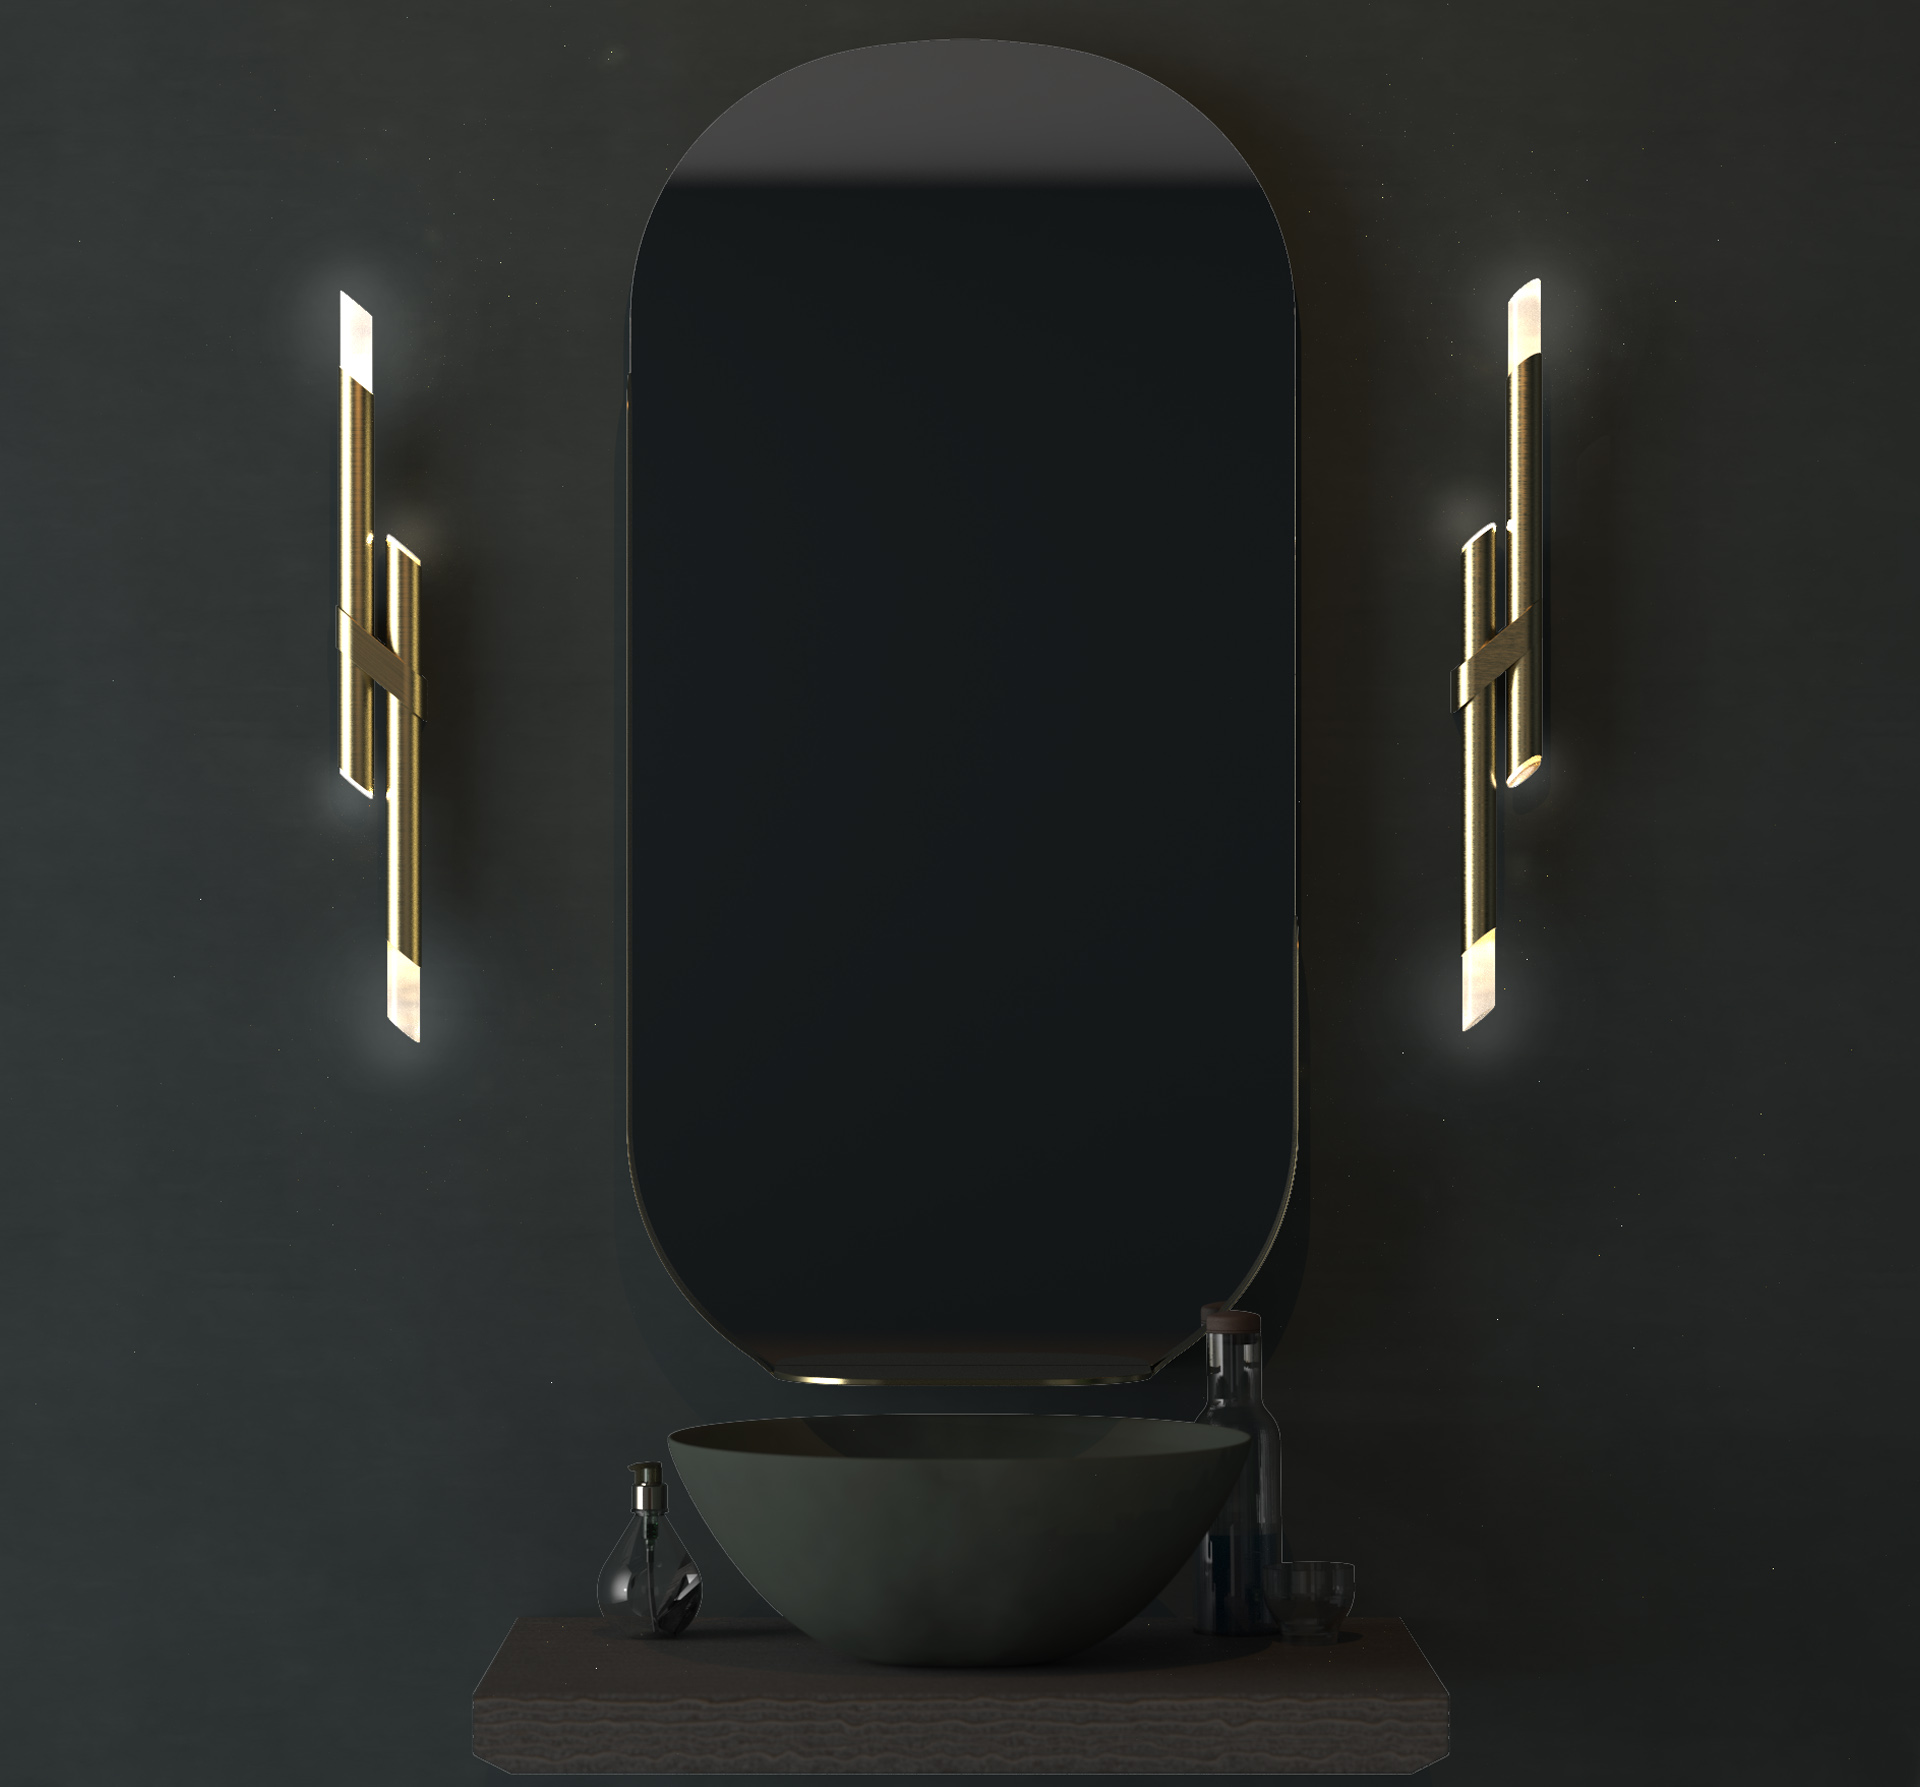 Contemporary Bathroom Wall Lights Brass Rods Illuminated Tips Mirror Dark Moody Interior Palette Designers Nulty Bespoke